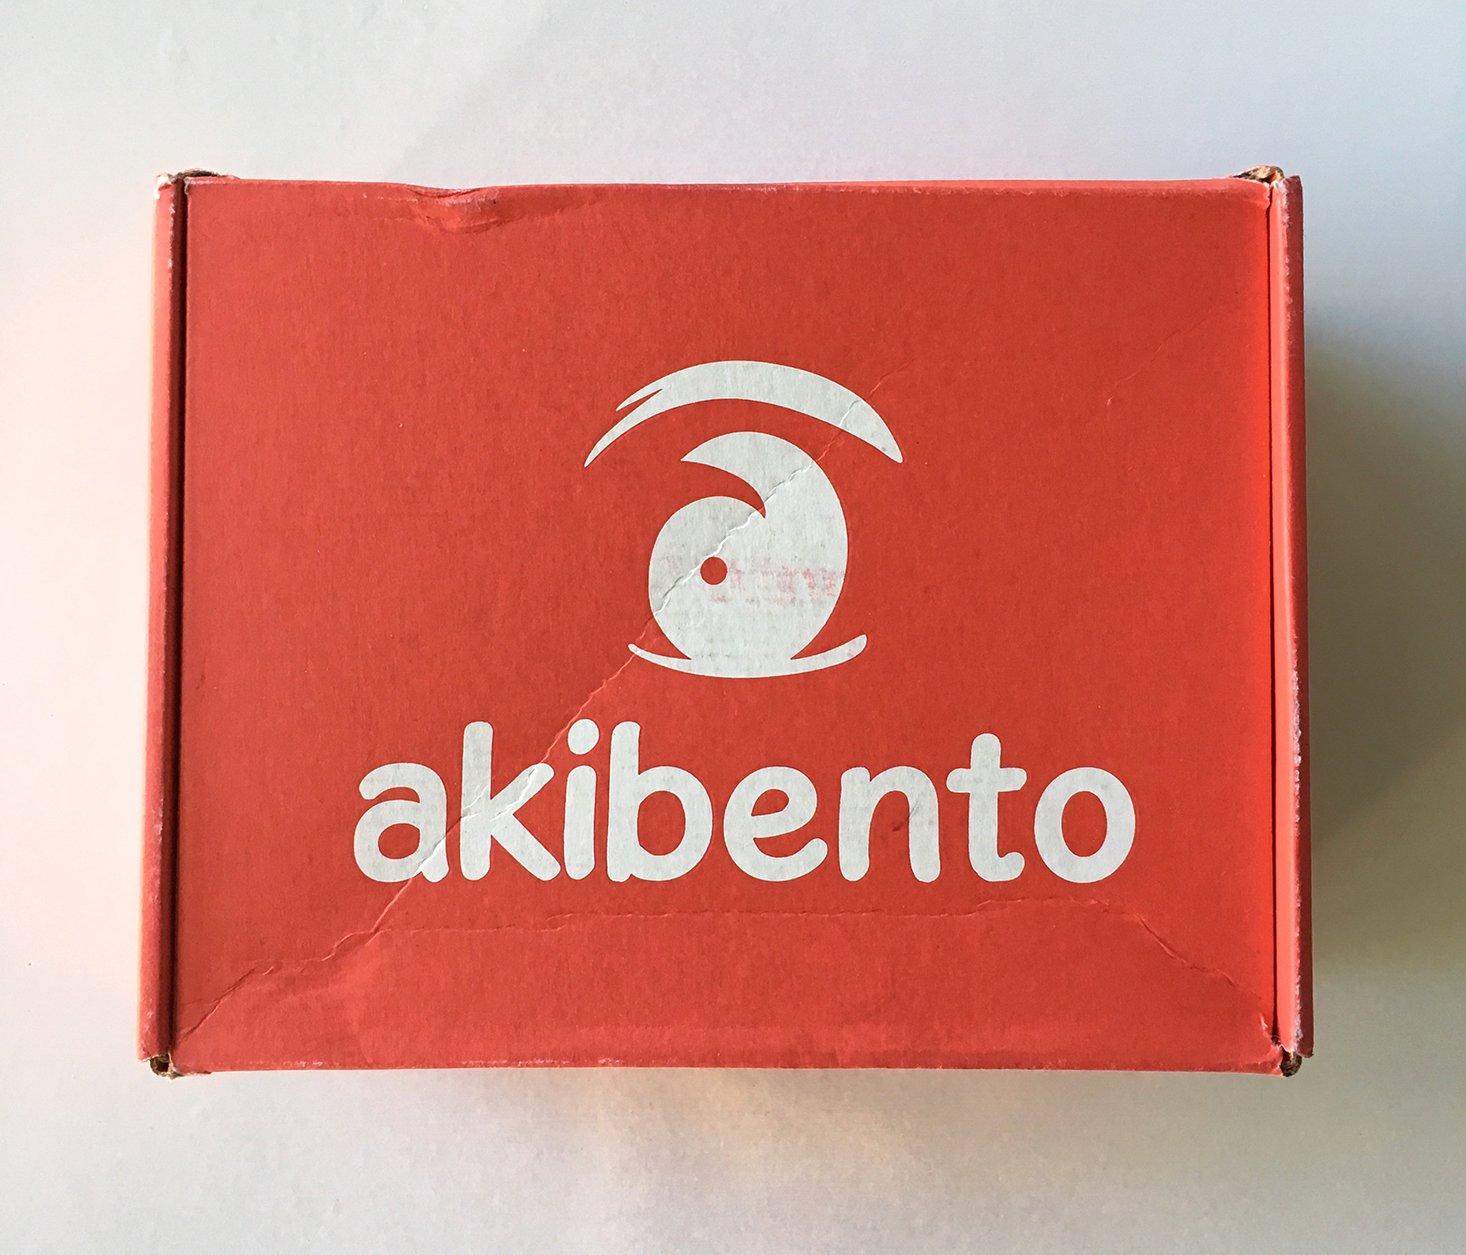 akibento-october-2016-box